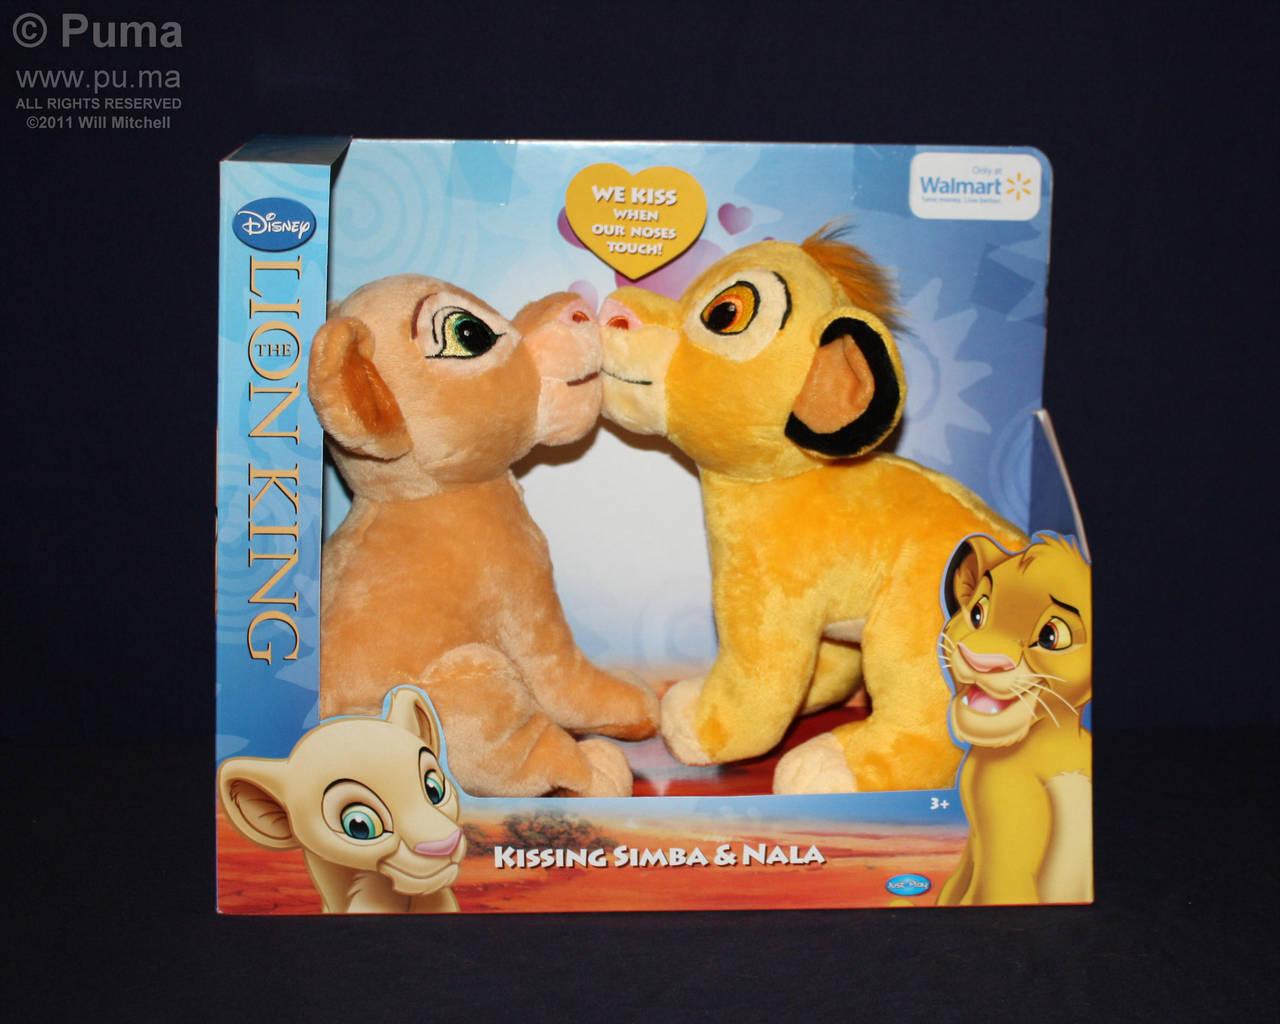 2011 Kissing Simba and Nala by dapumakat on DeviantArt